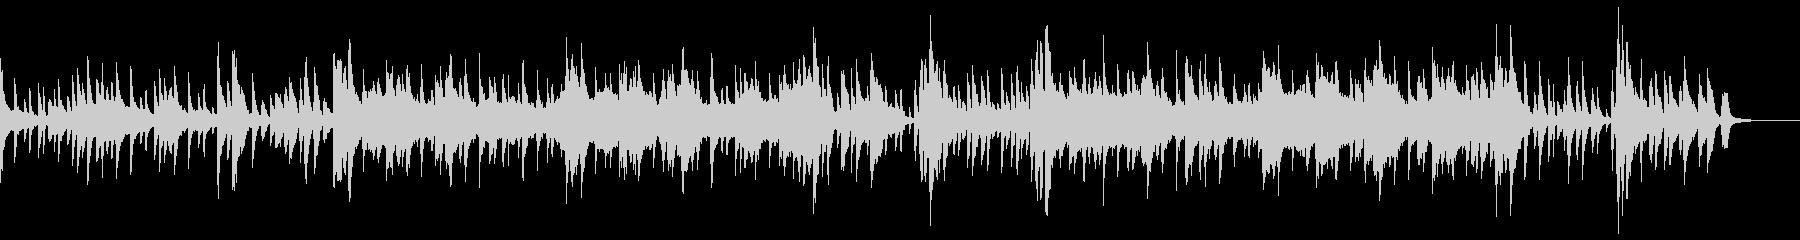 Goto3 2mixの未再生の波形